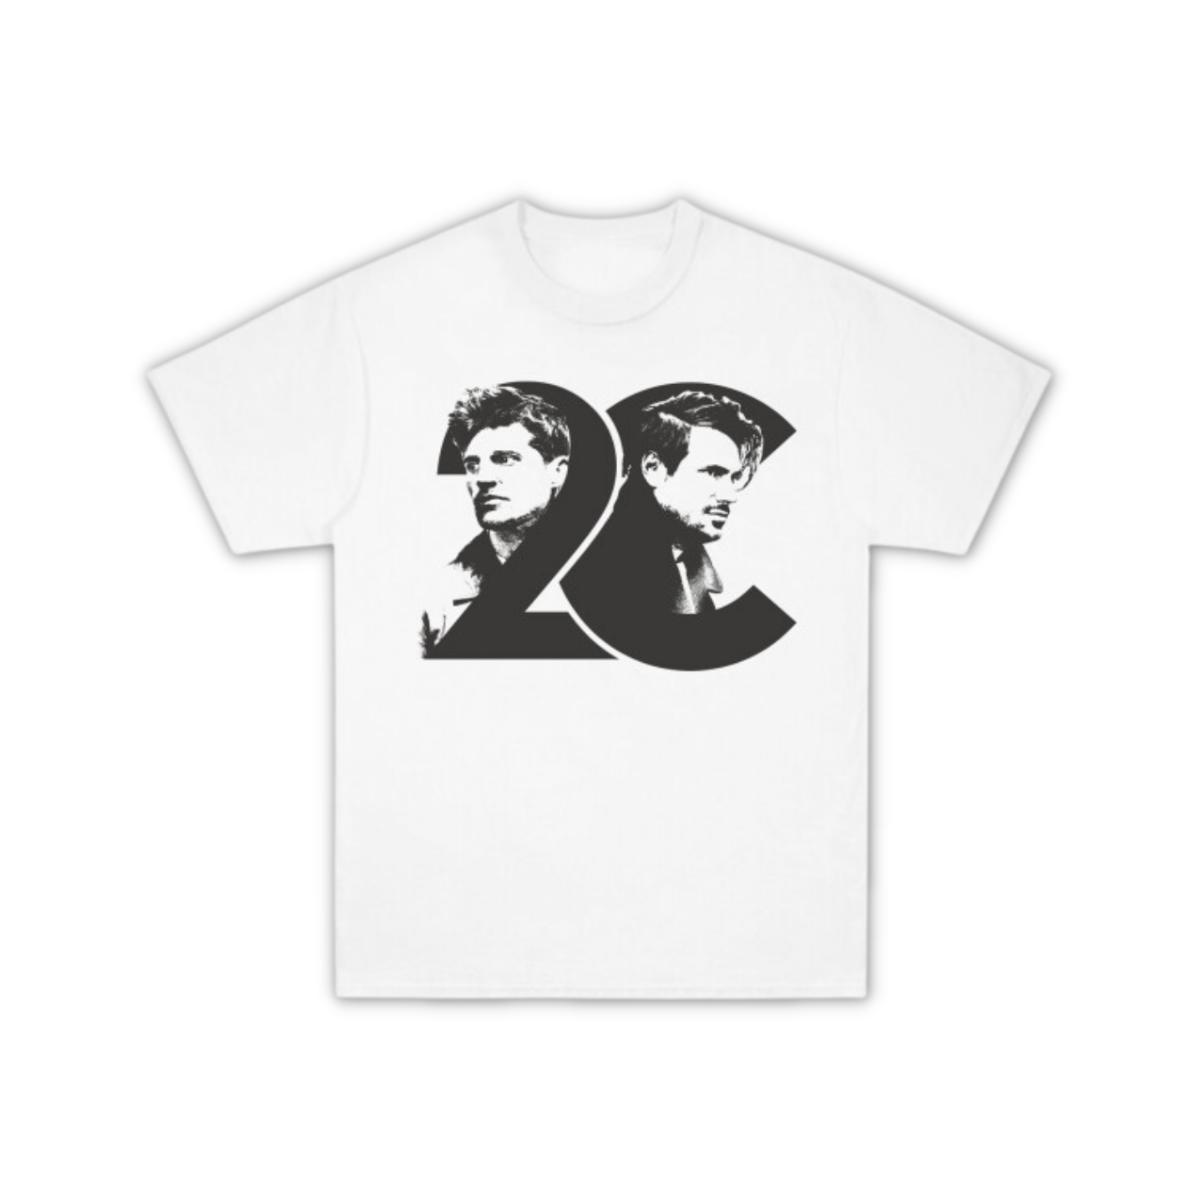 Buy Online 2 Cellos - 2CELLOS Dedicated Photo White T-Shirt